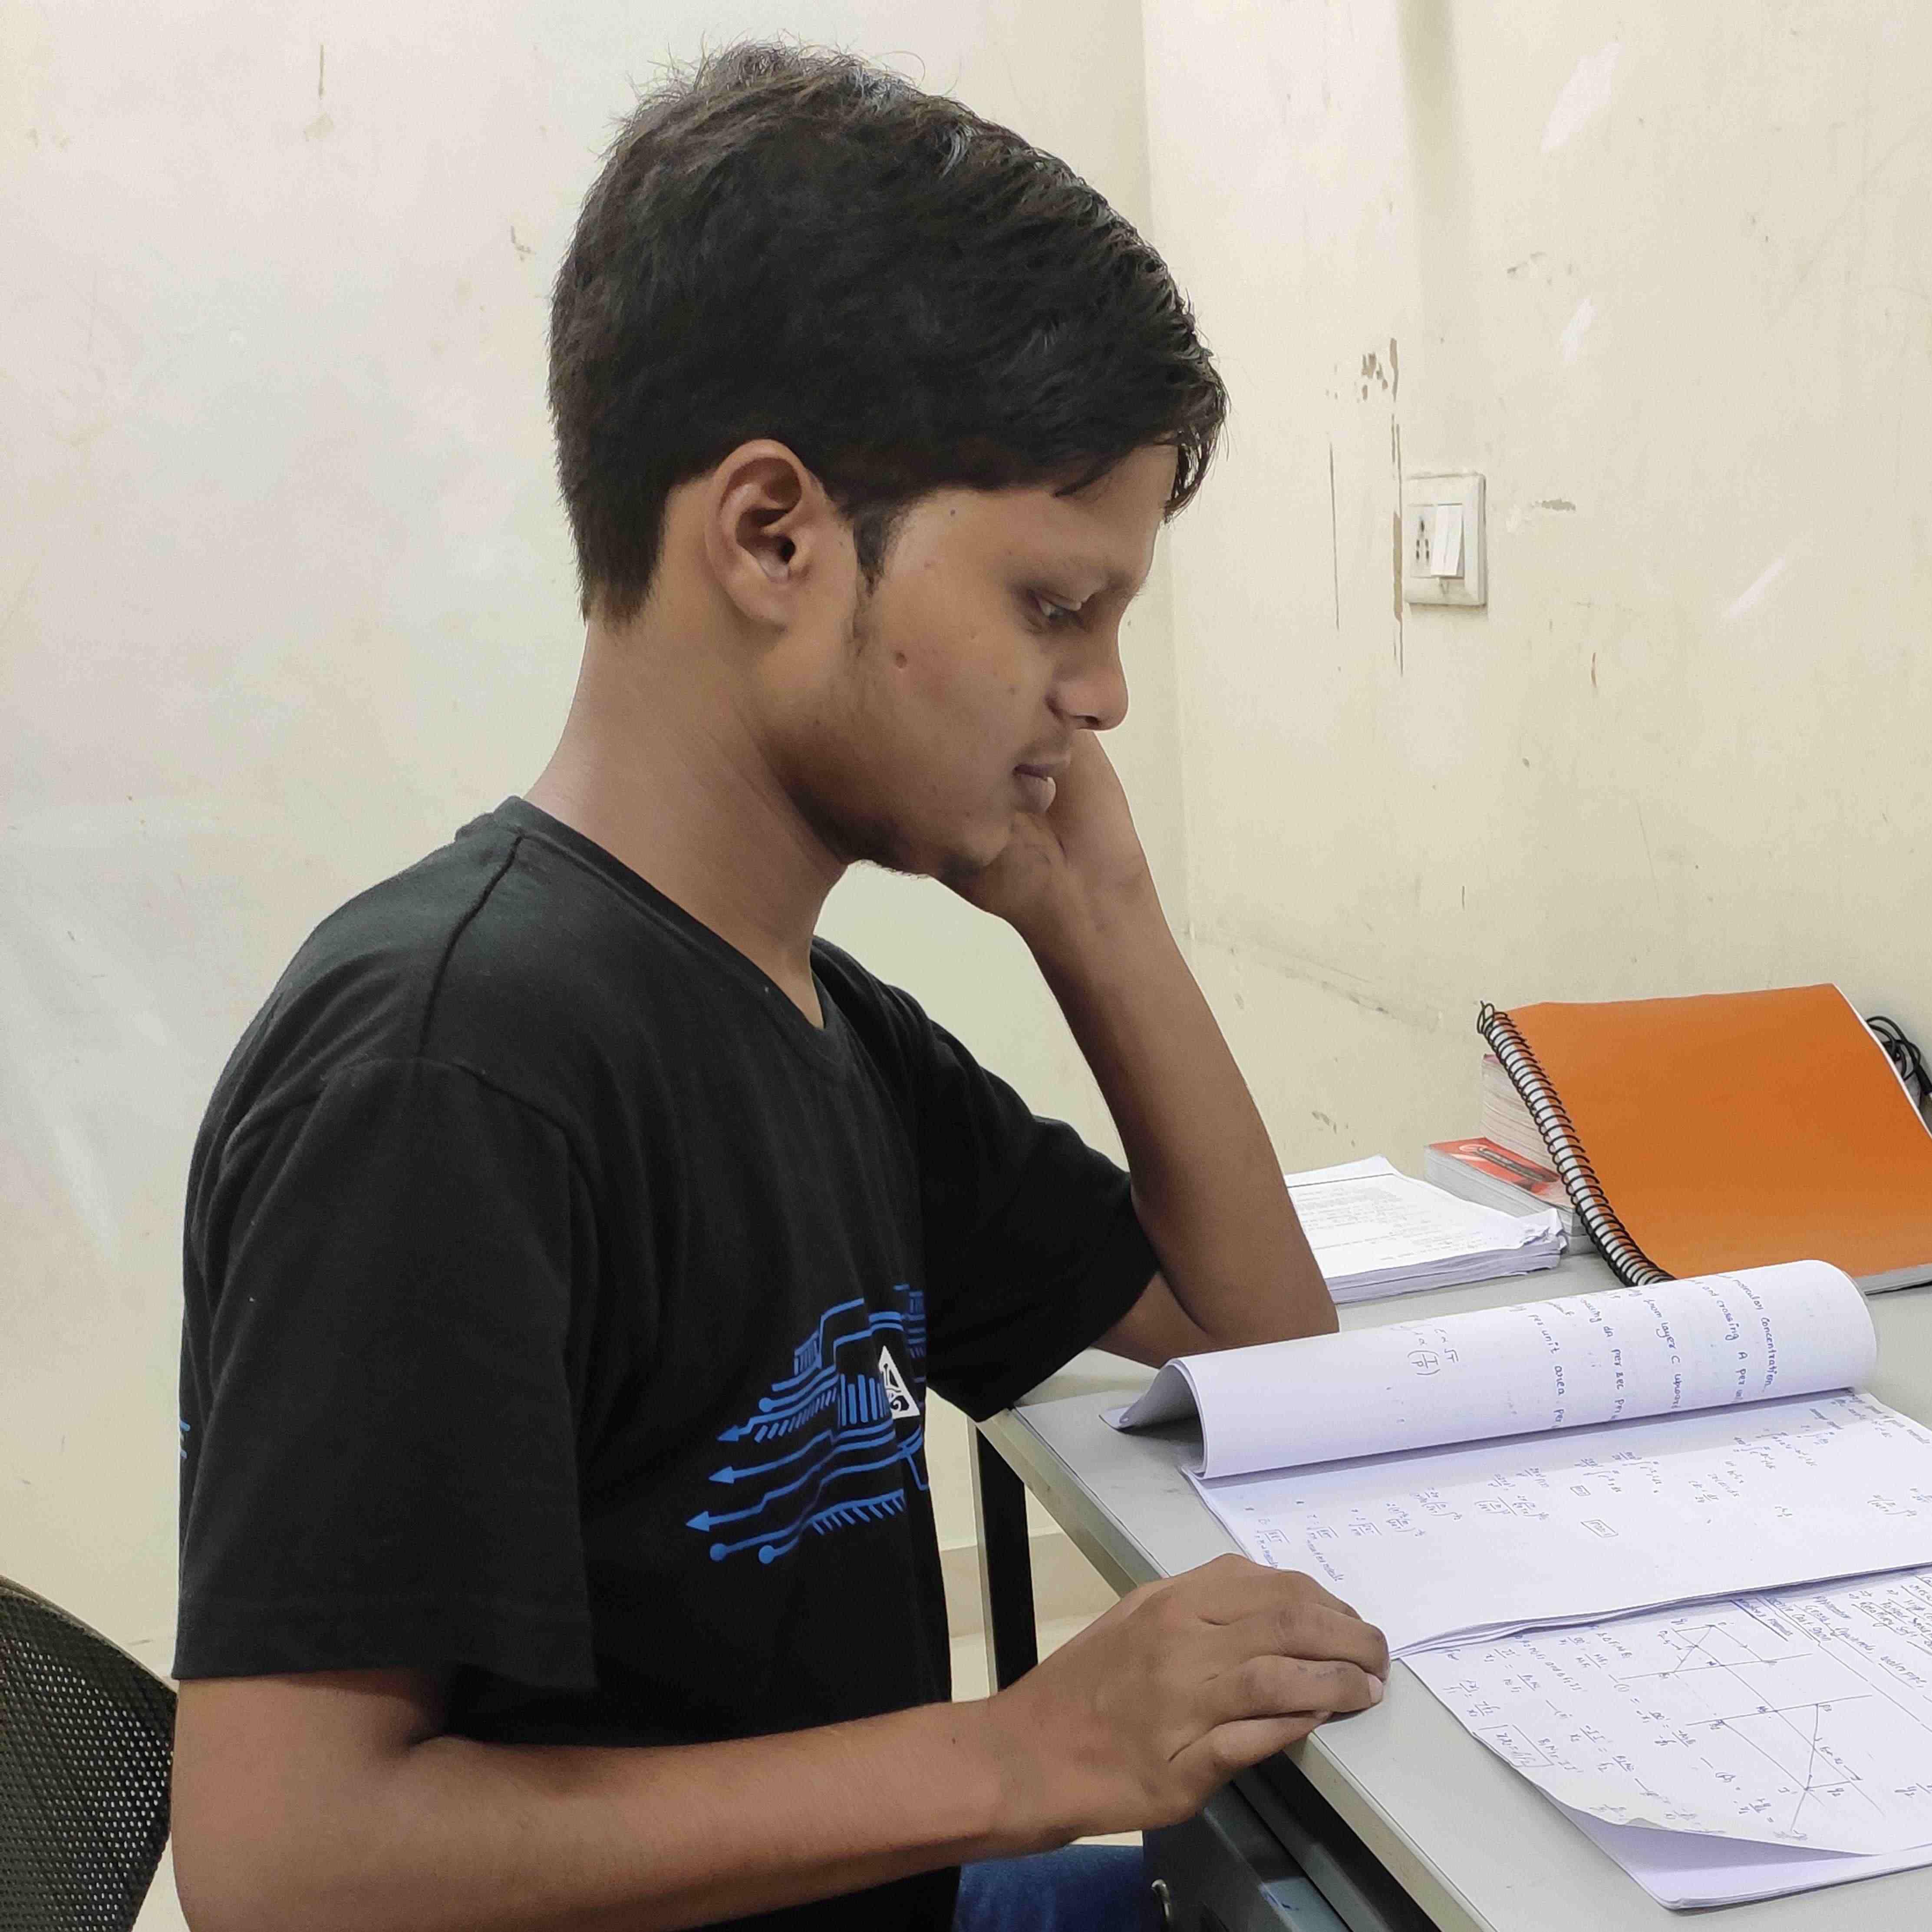 Ankur Bharti